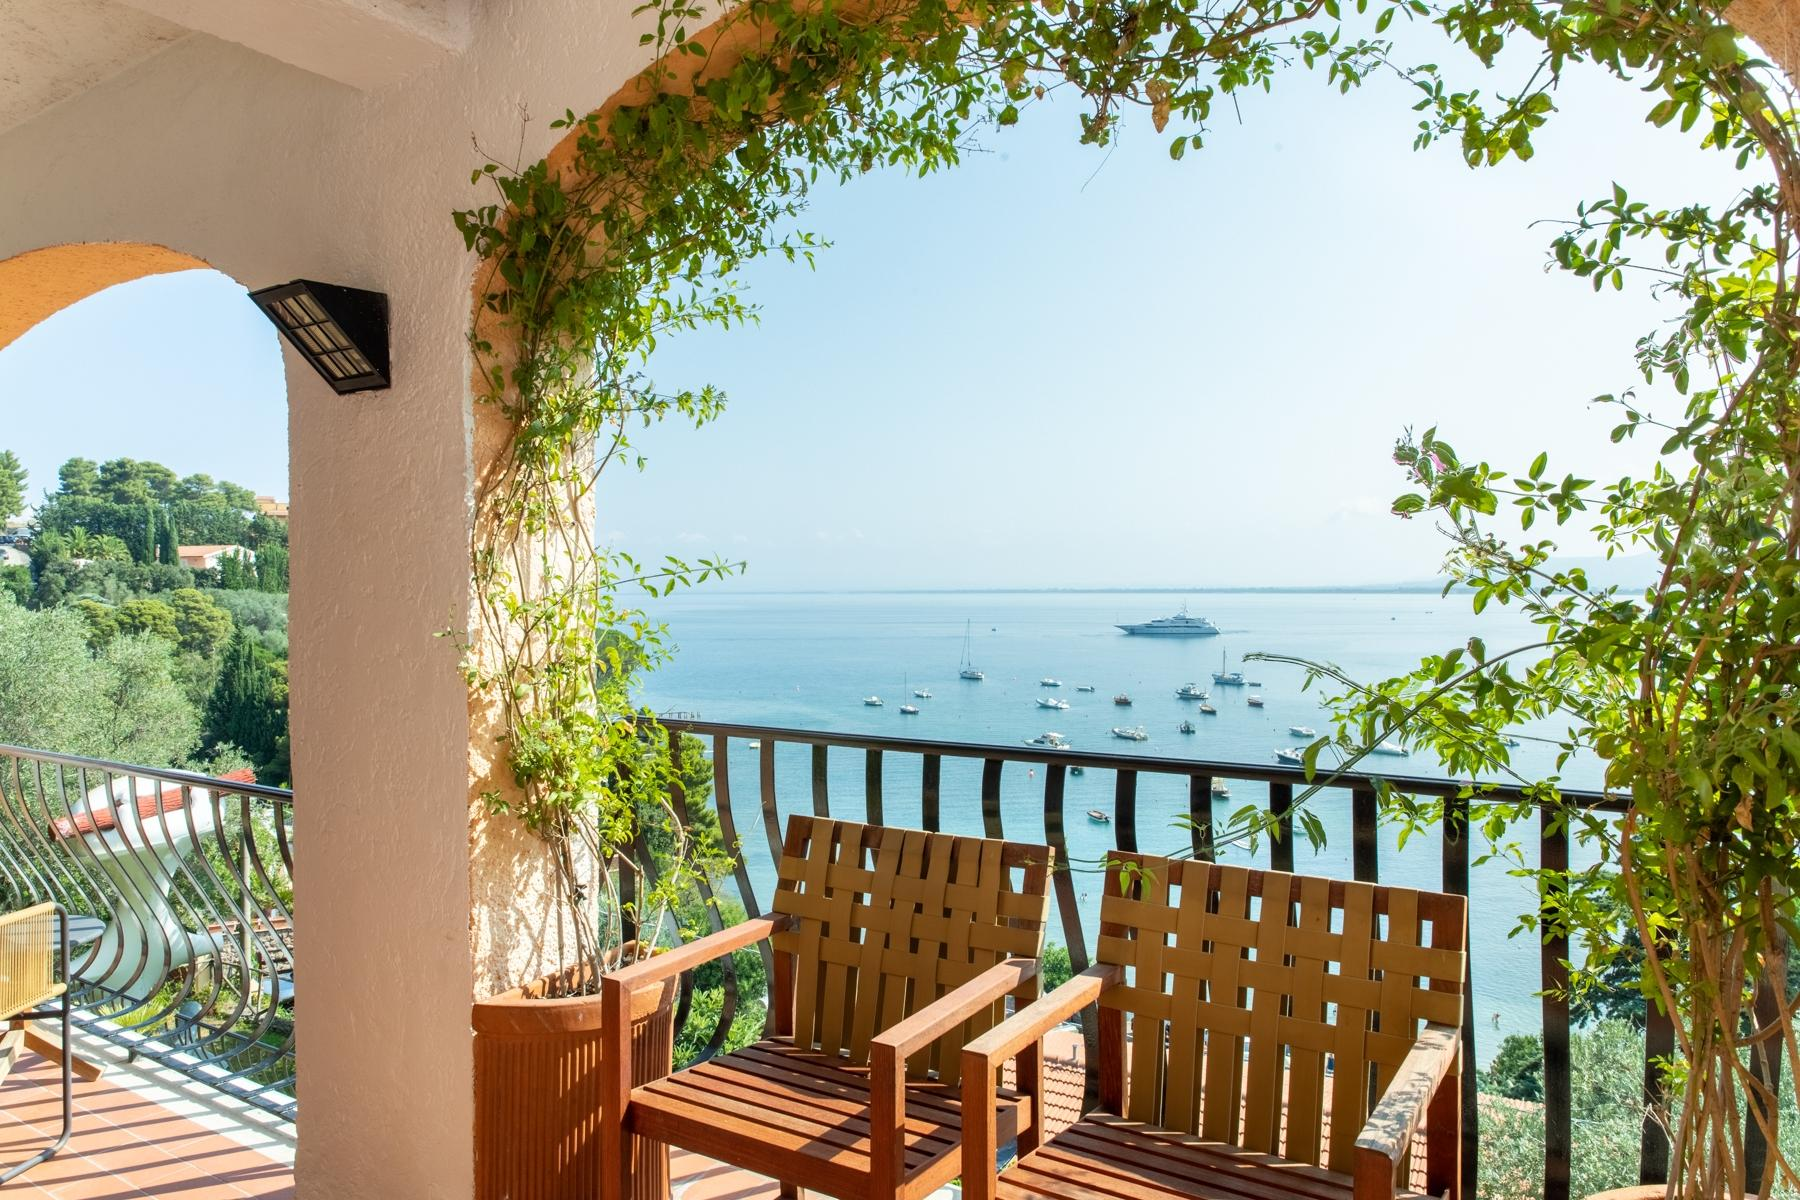 Superbe villa avec piscine au bord de la  mer - 4